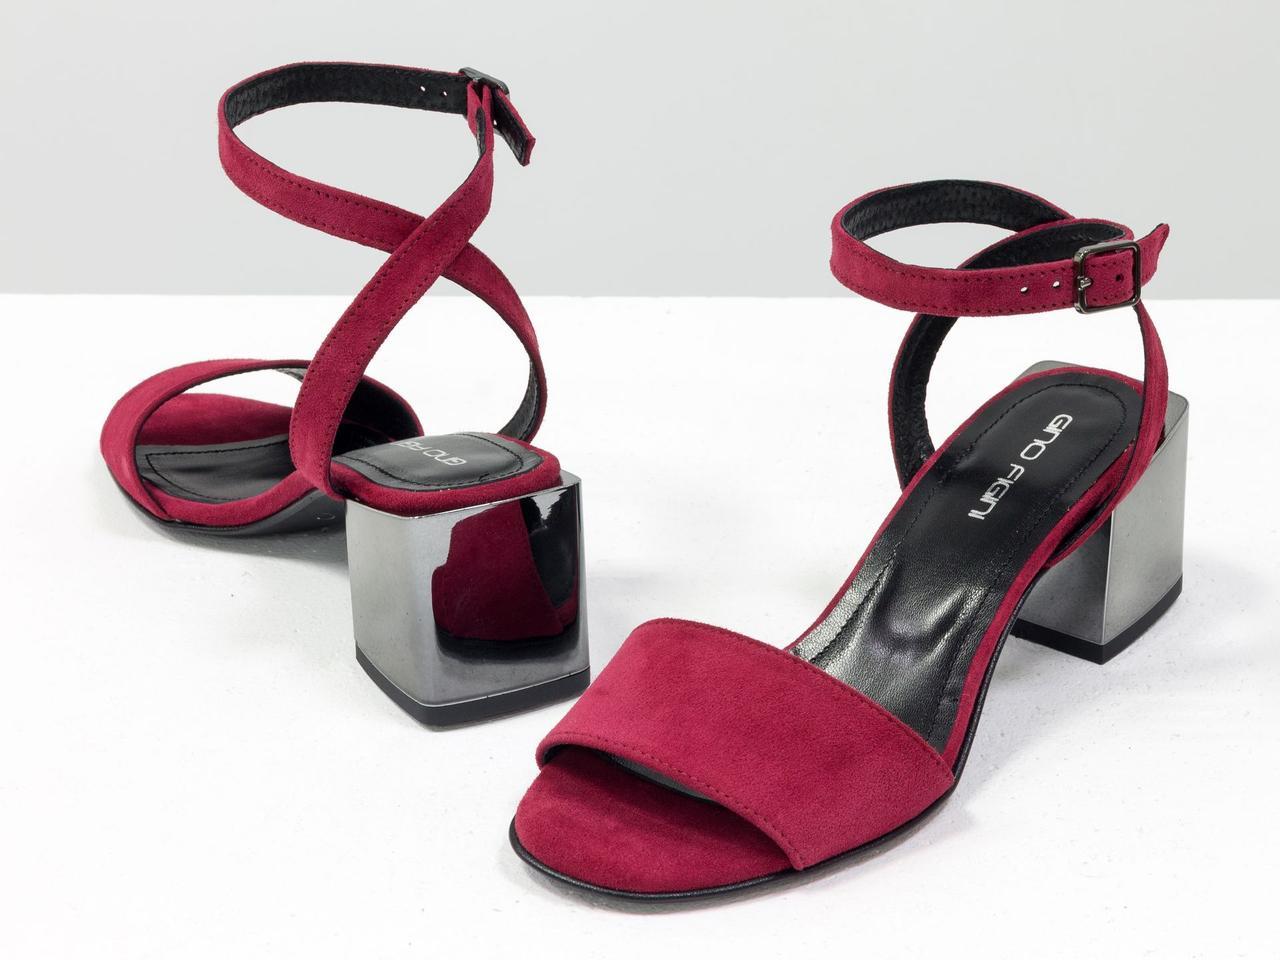 Босоножки на квадратном каблуке с металлическим блеском, с ремешком вокруг щиколотки